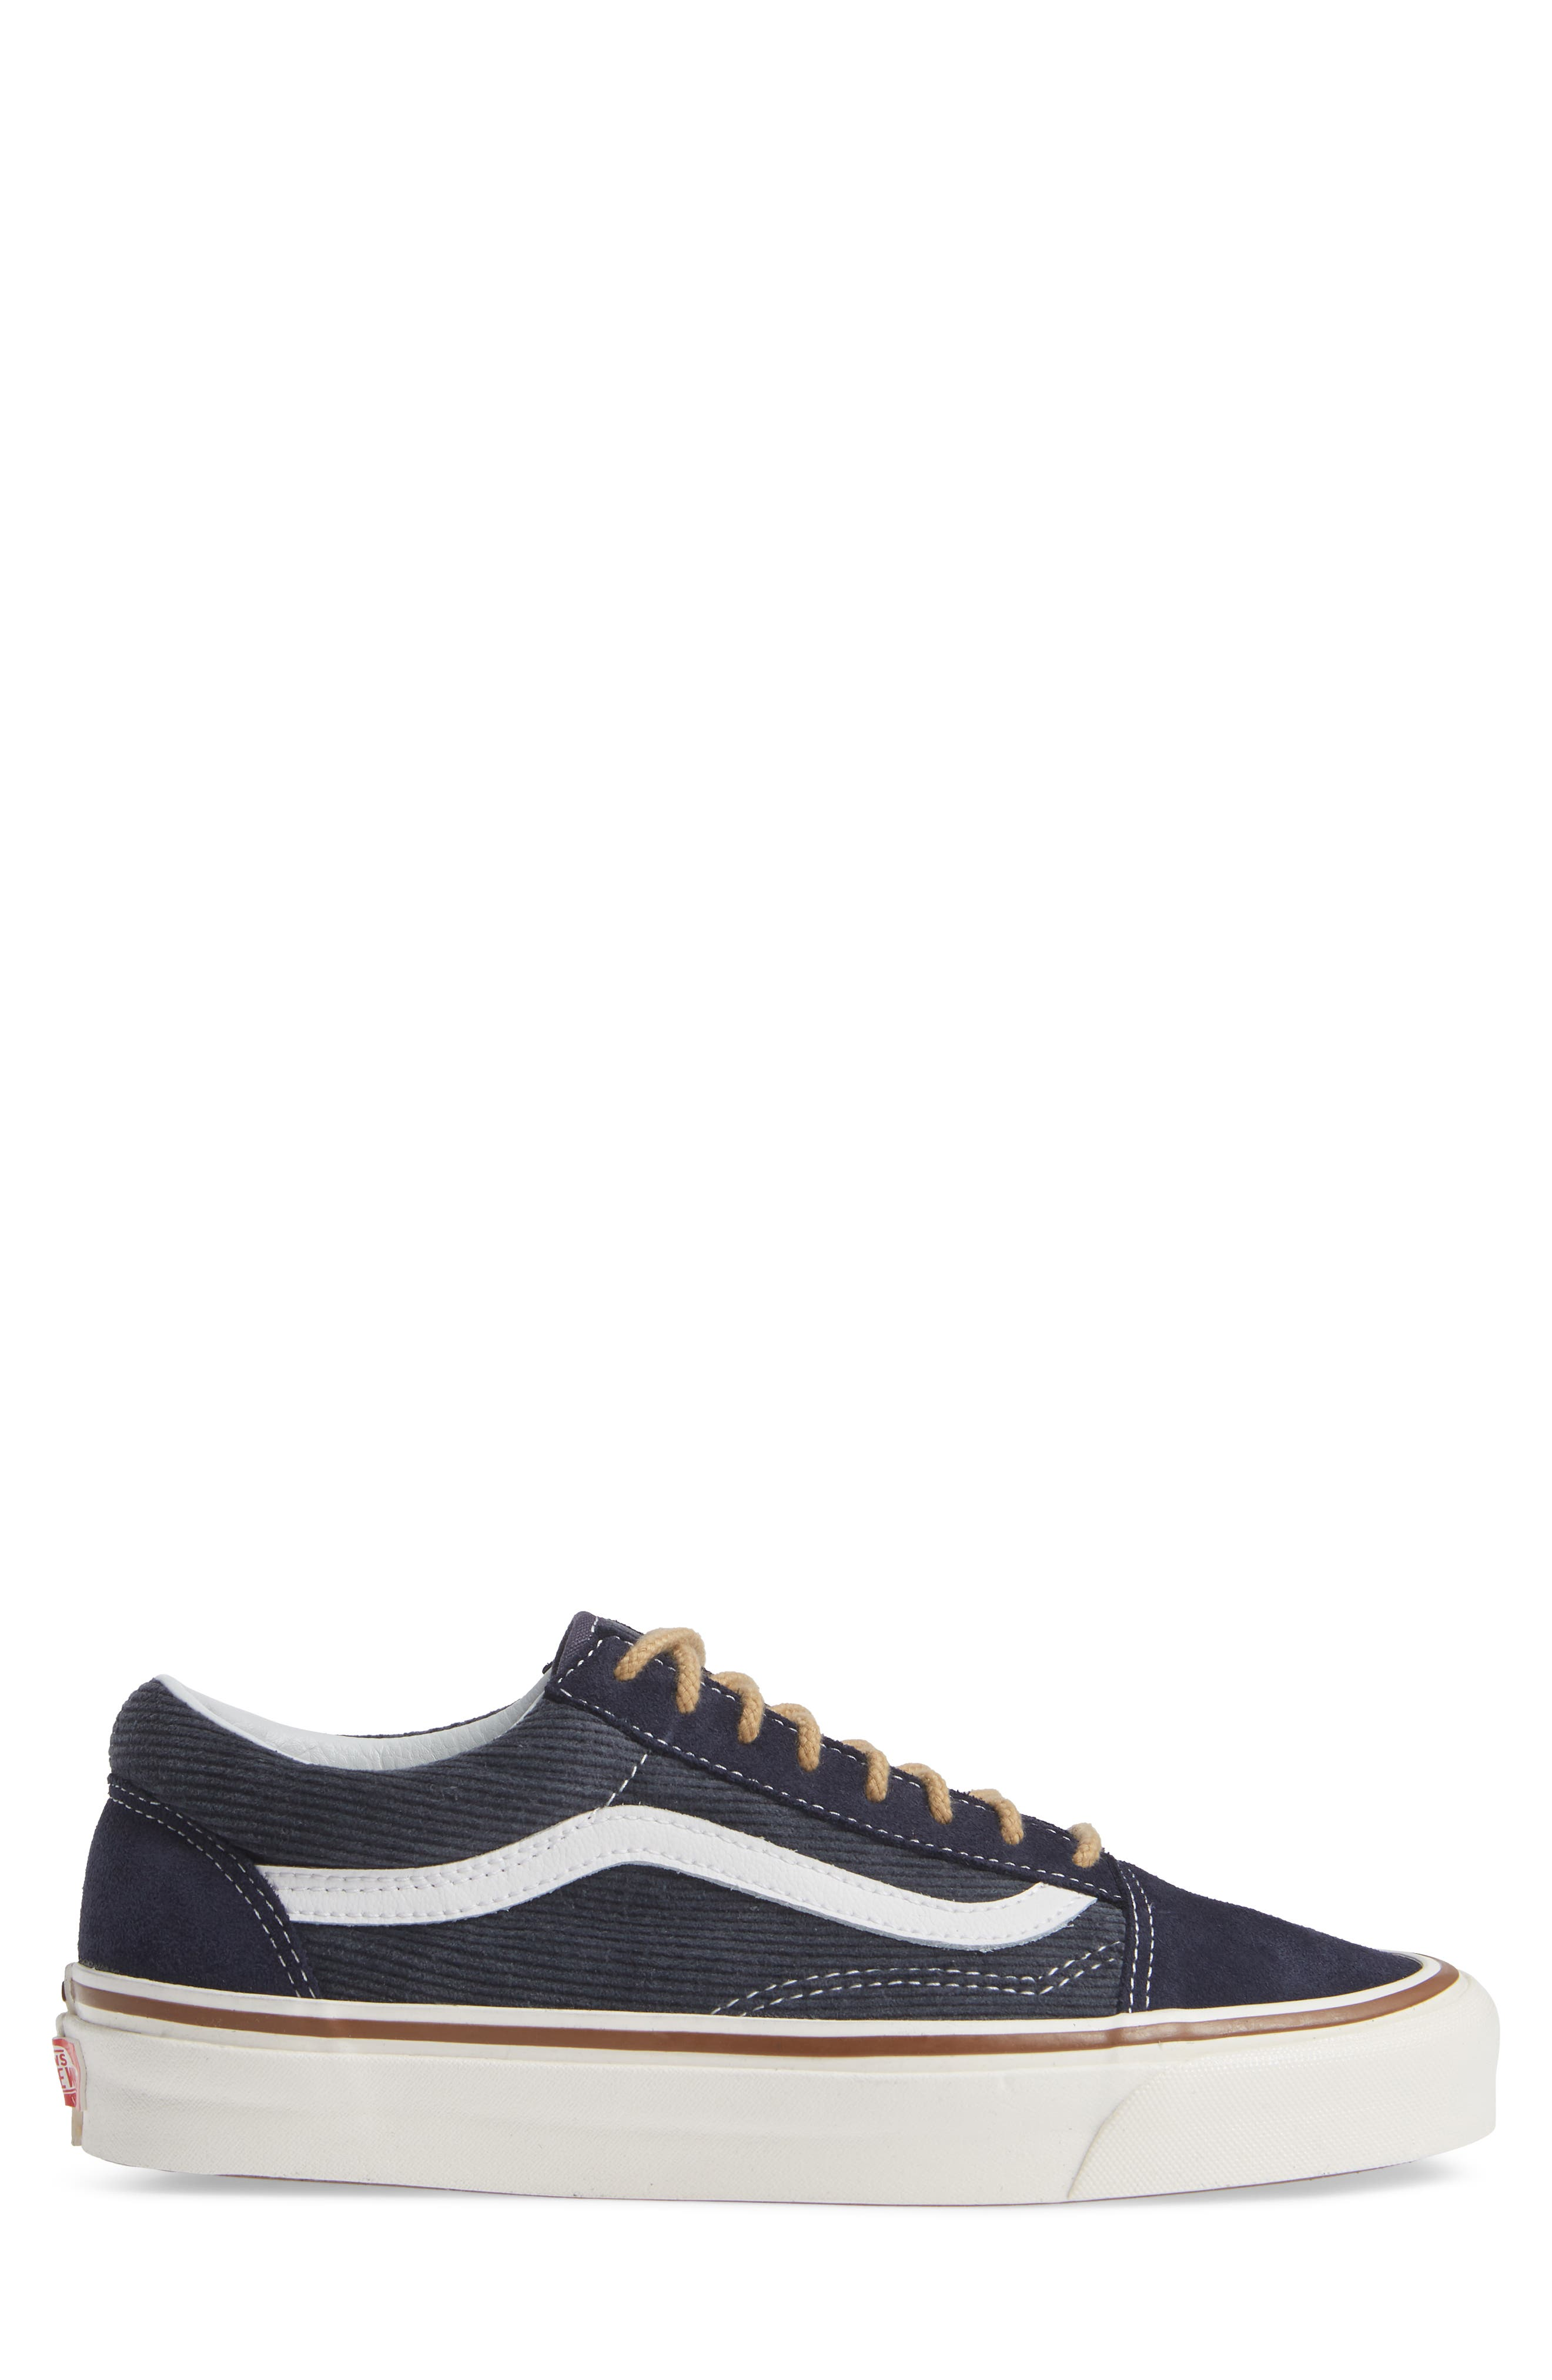 Anaheim Factory Old Skool 36 DX Sneaker,                             Alternate thumbnail 3, color,                             NAVY/ SUEDE/ CORDUROY